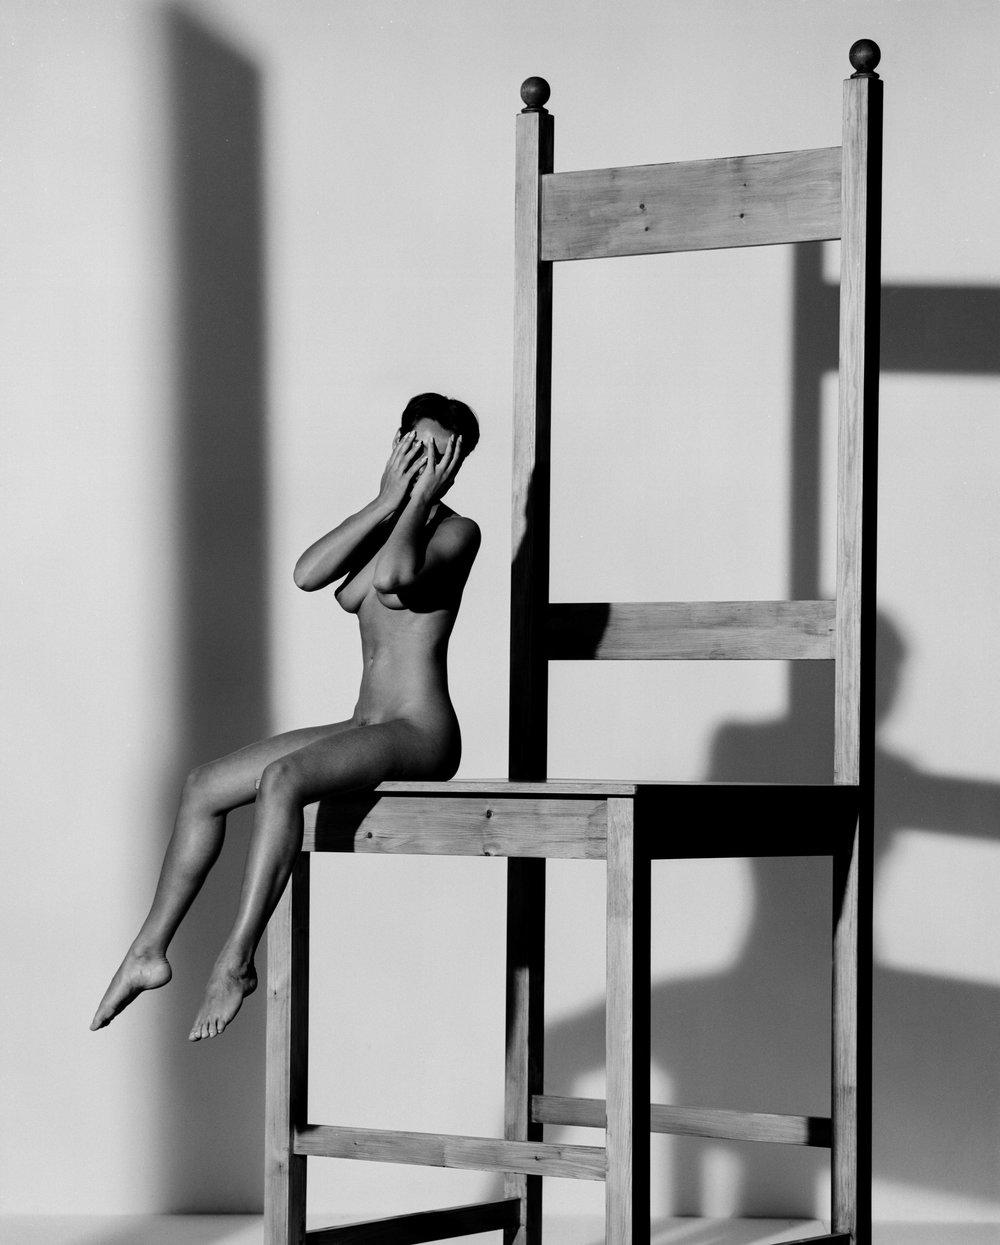 © John Swannell